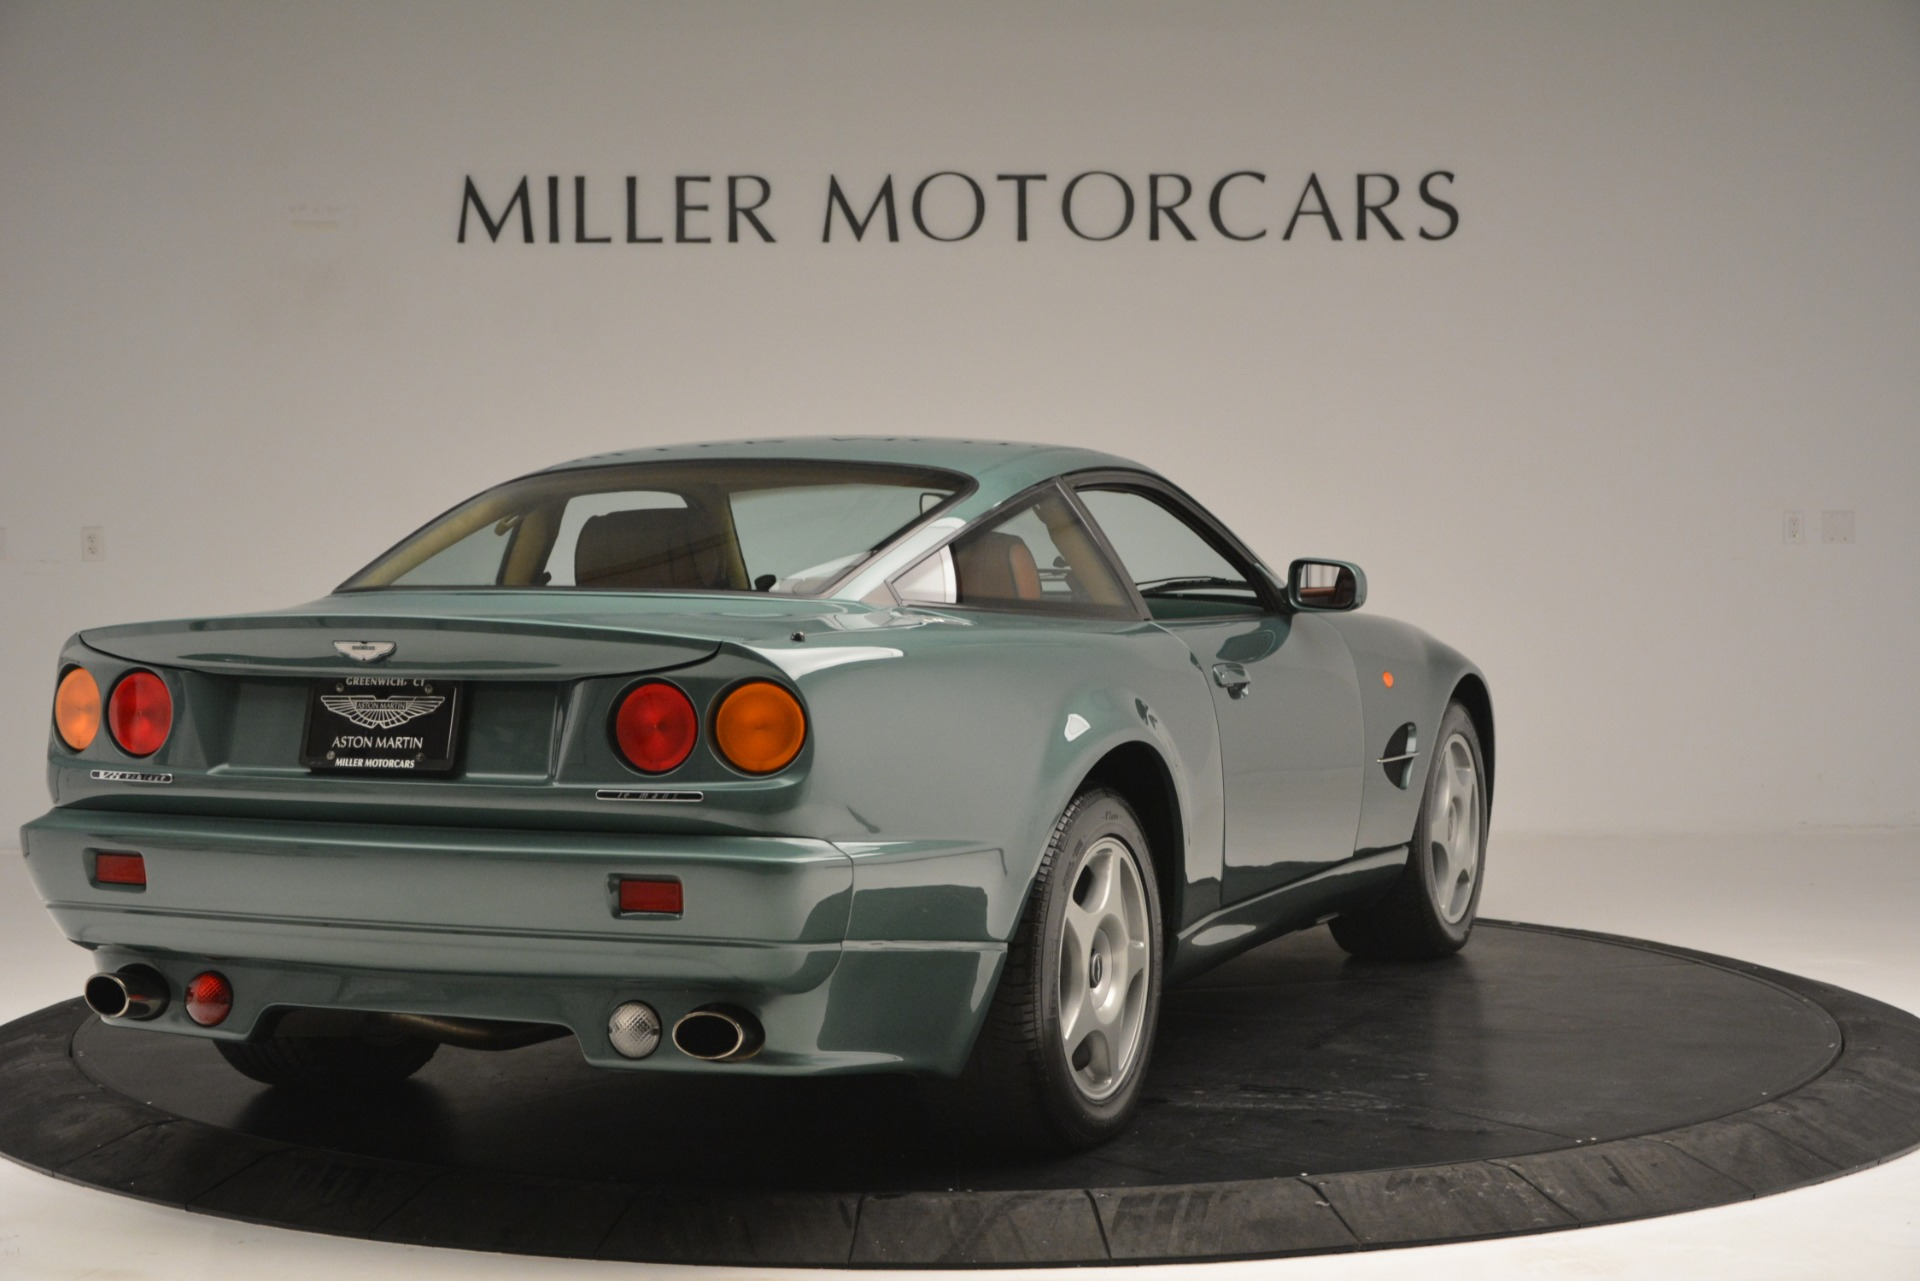 Pre Owned 1999 Aston Martin V8 Vantage Le Mans V600 Coupe For Sale 499 900 Miller Motorcars Stock 7449c